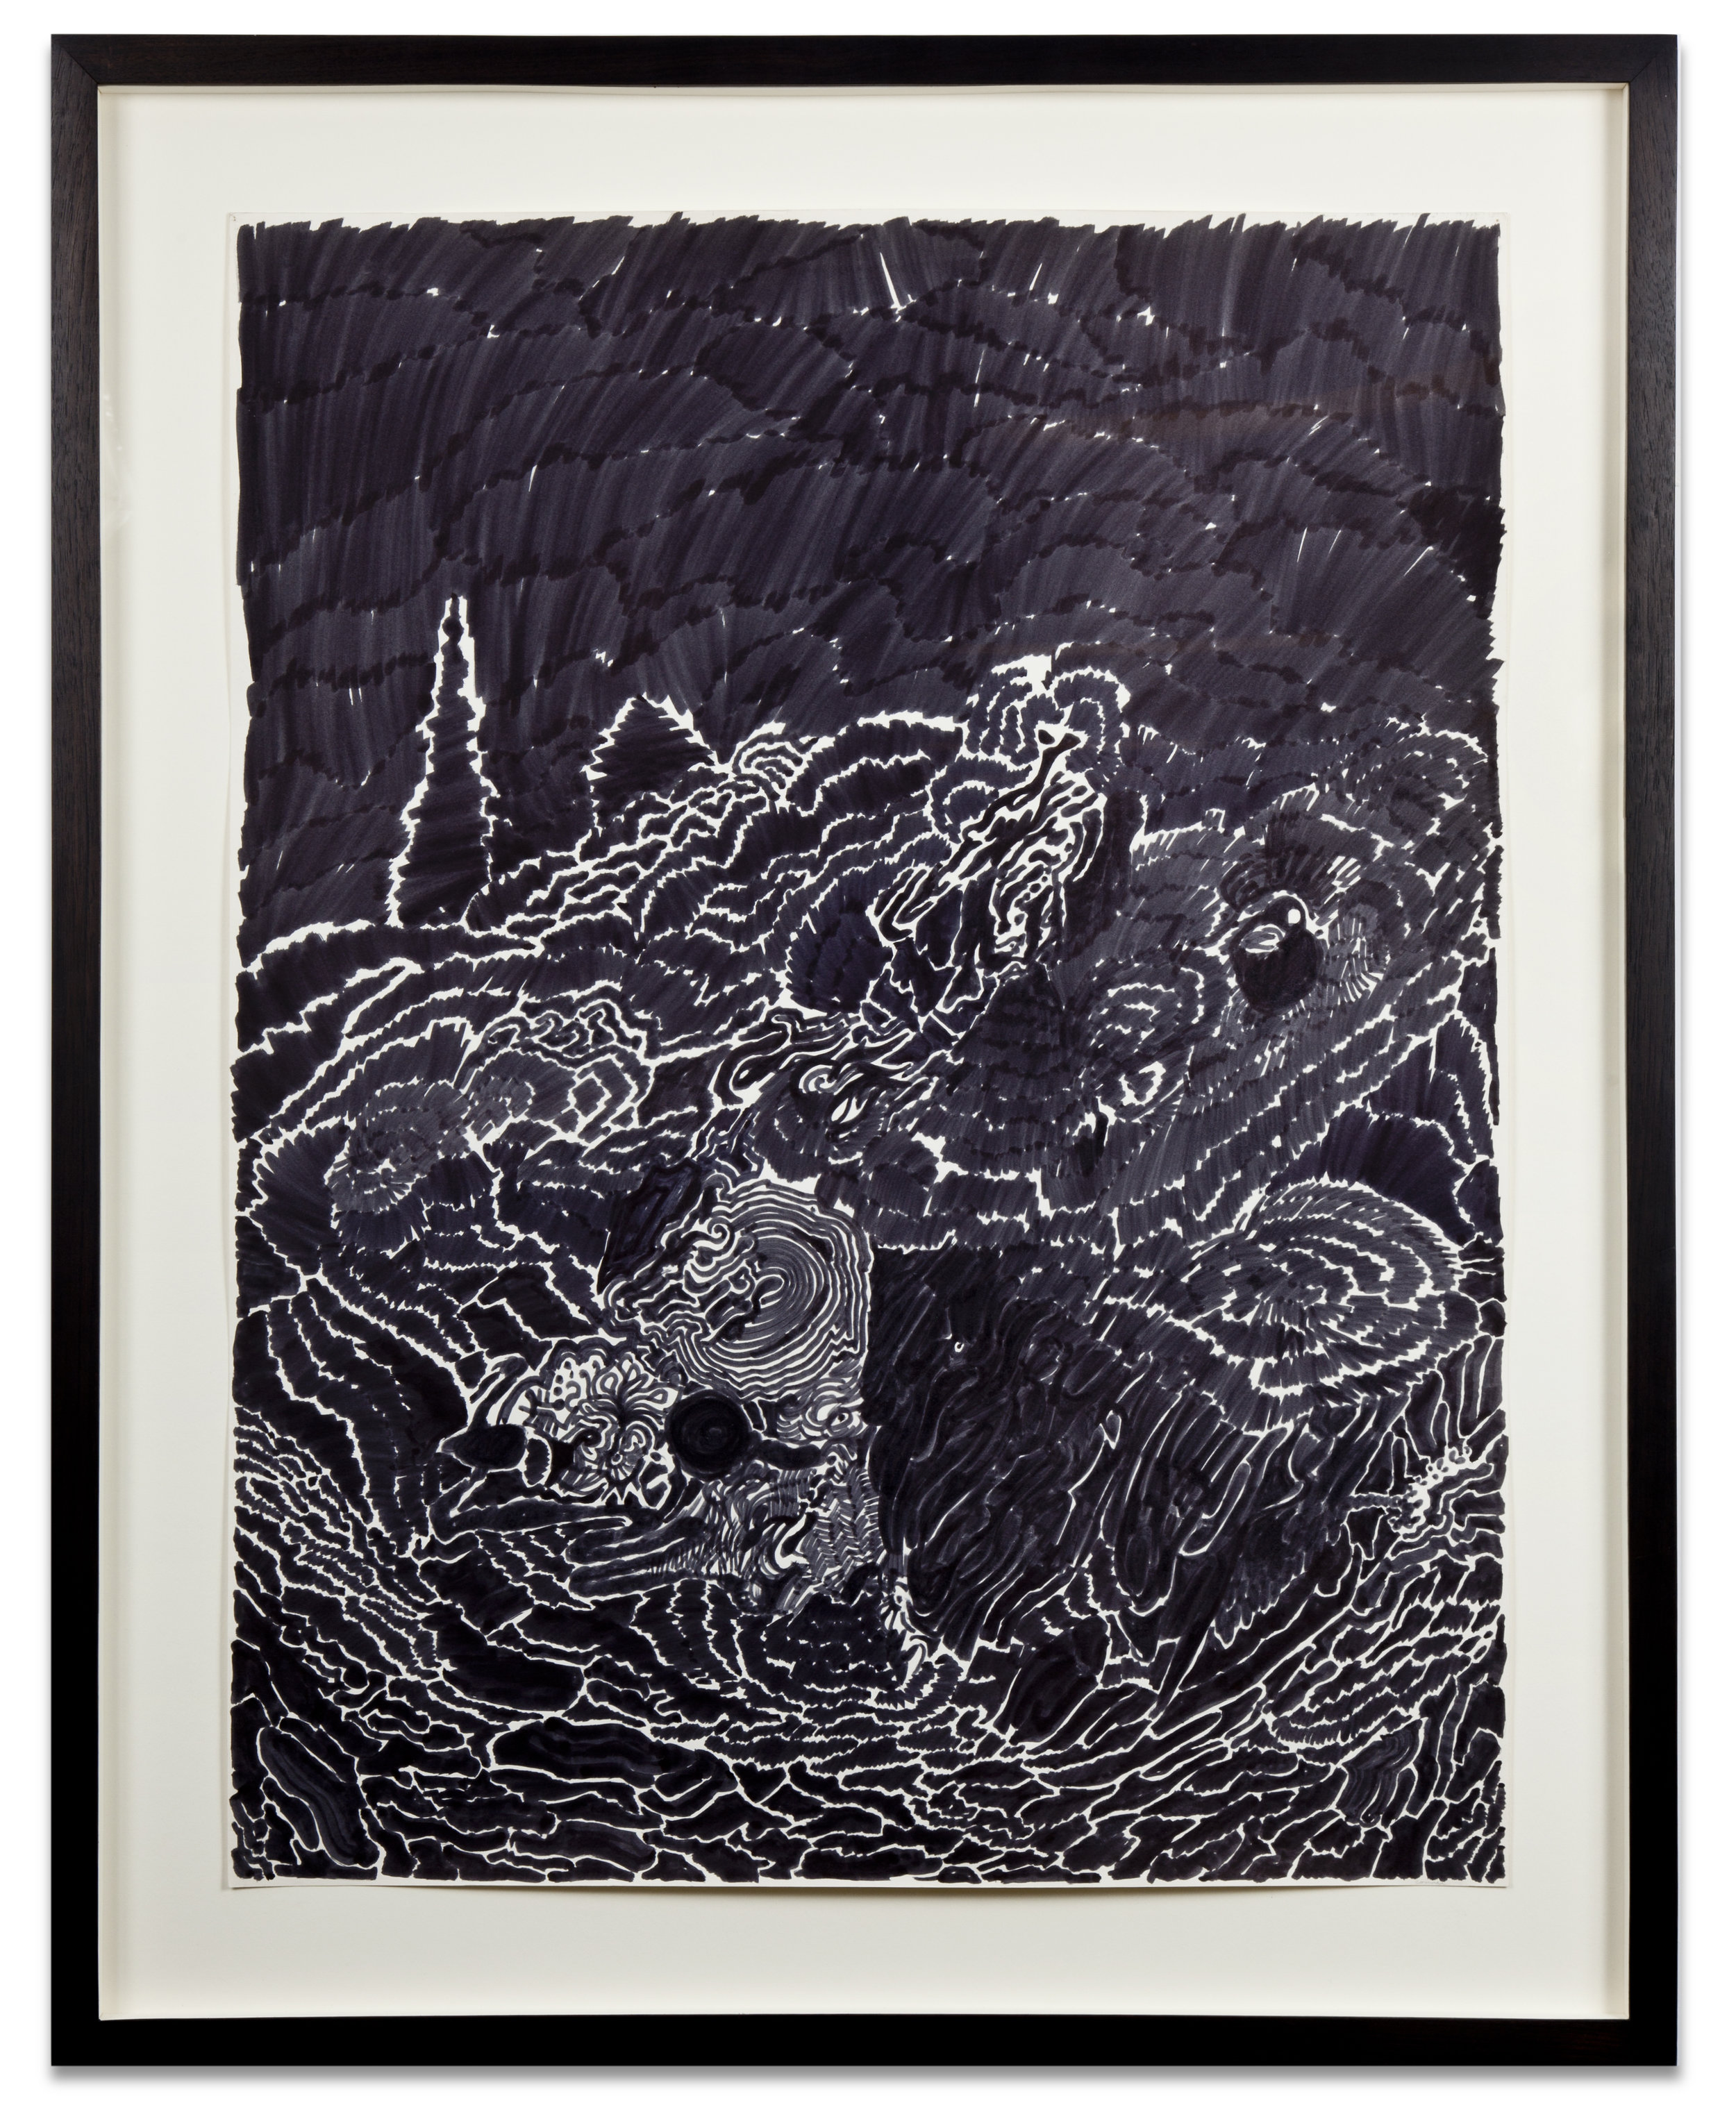 NEON NIGHT WICHITA, KANSAS, 1963, ink on paper, 26 1/8 x 20 inches